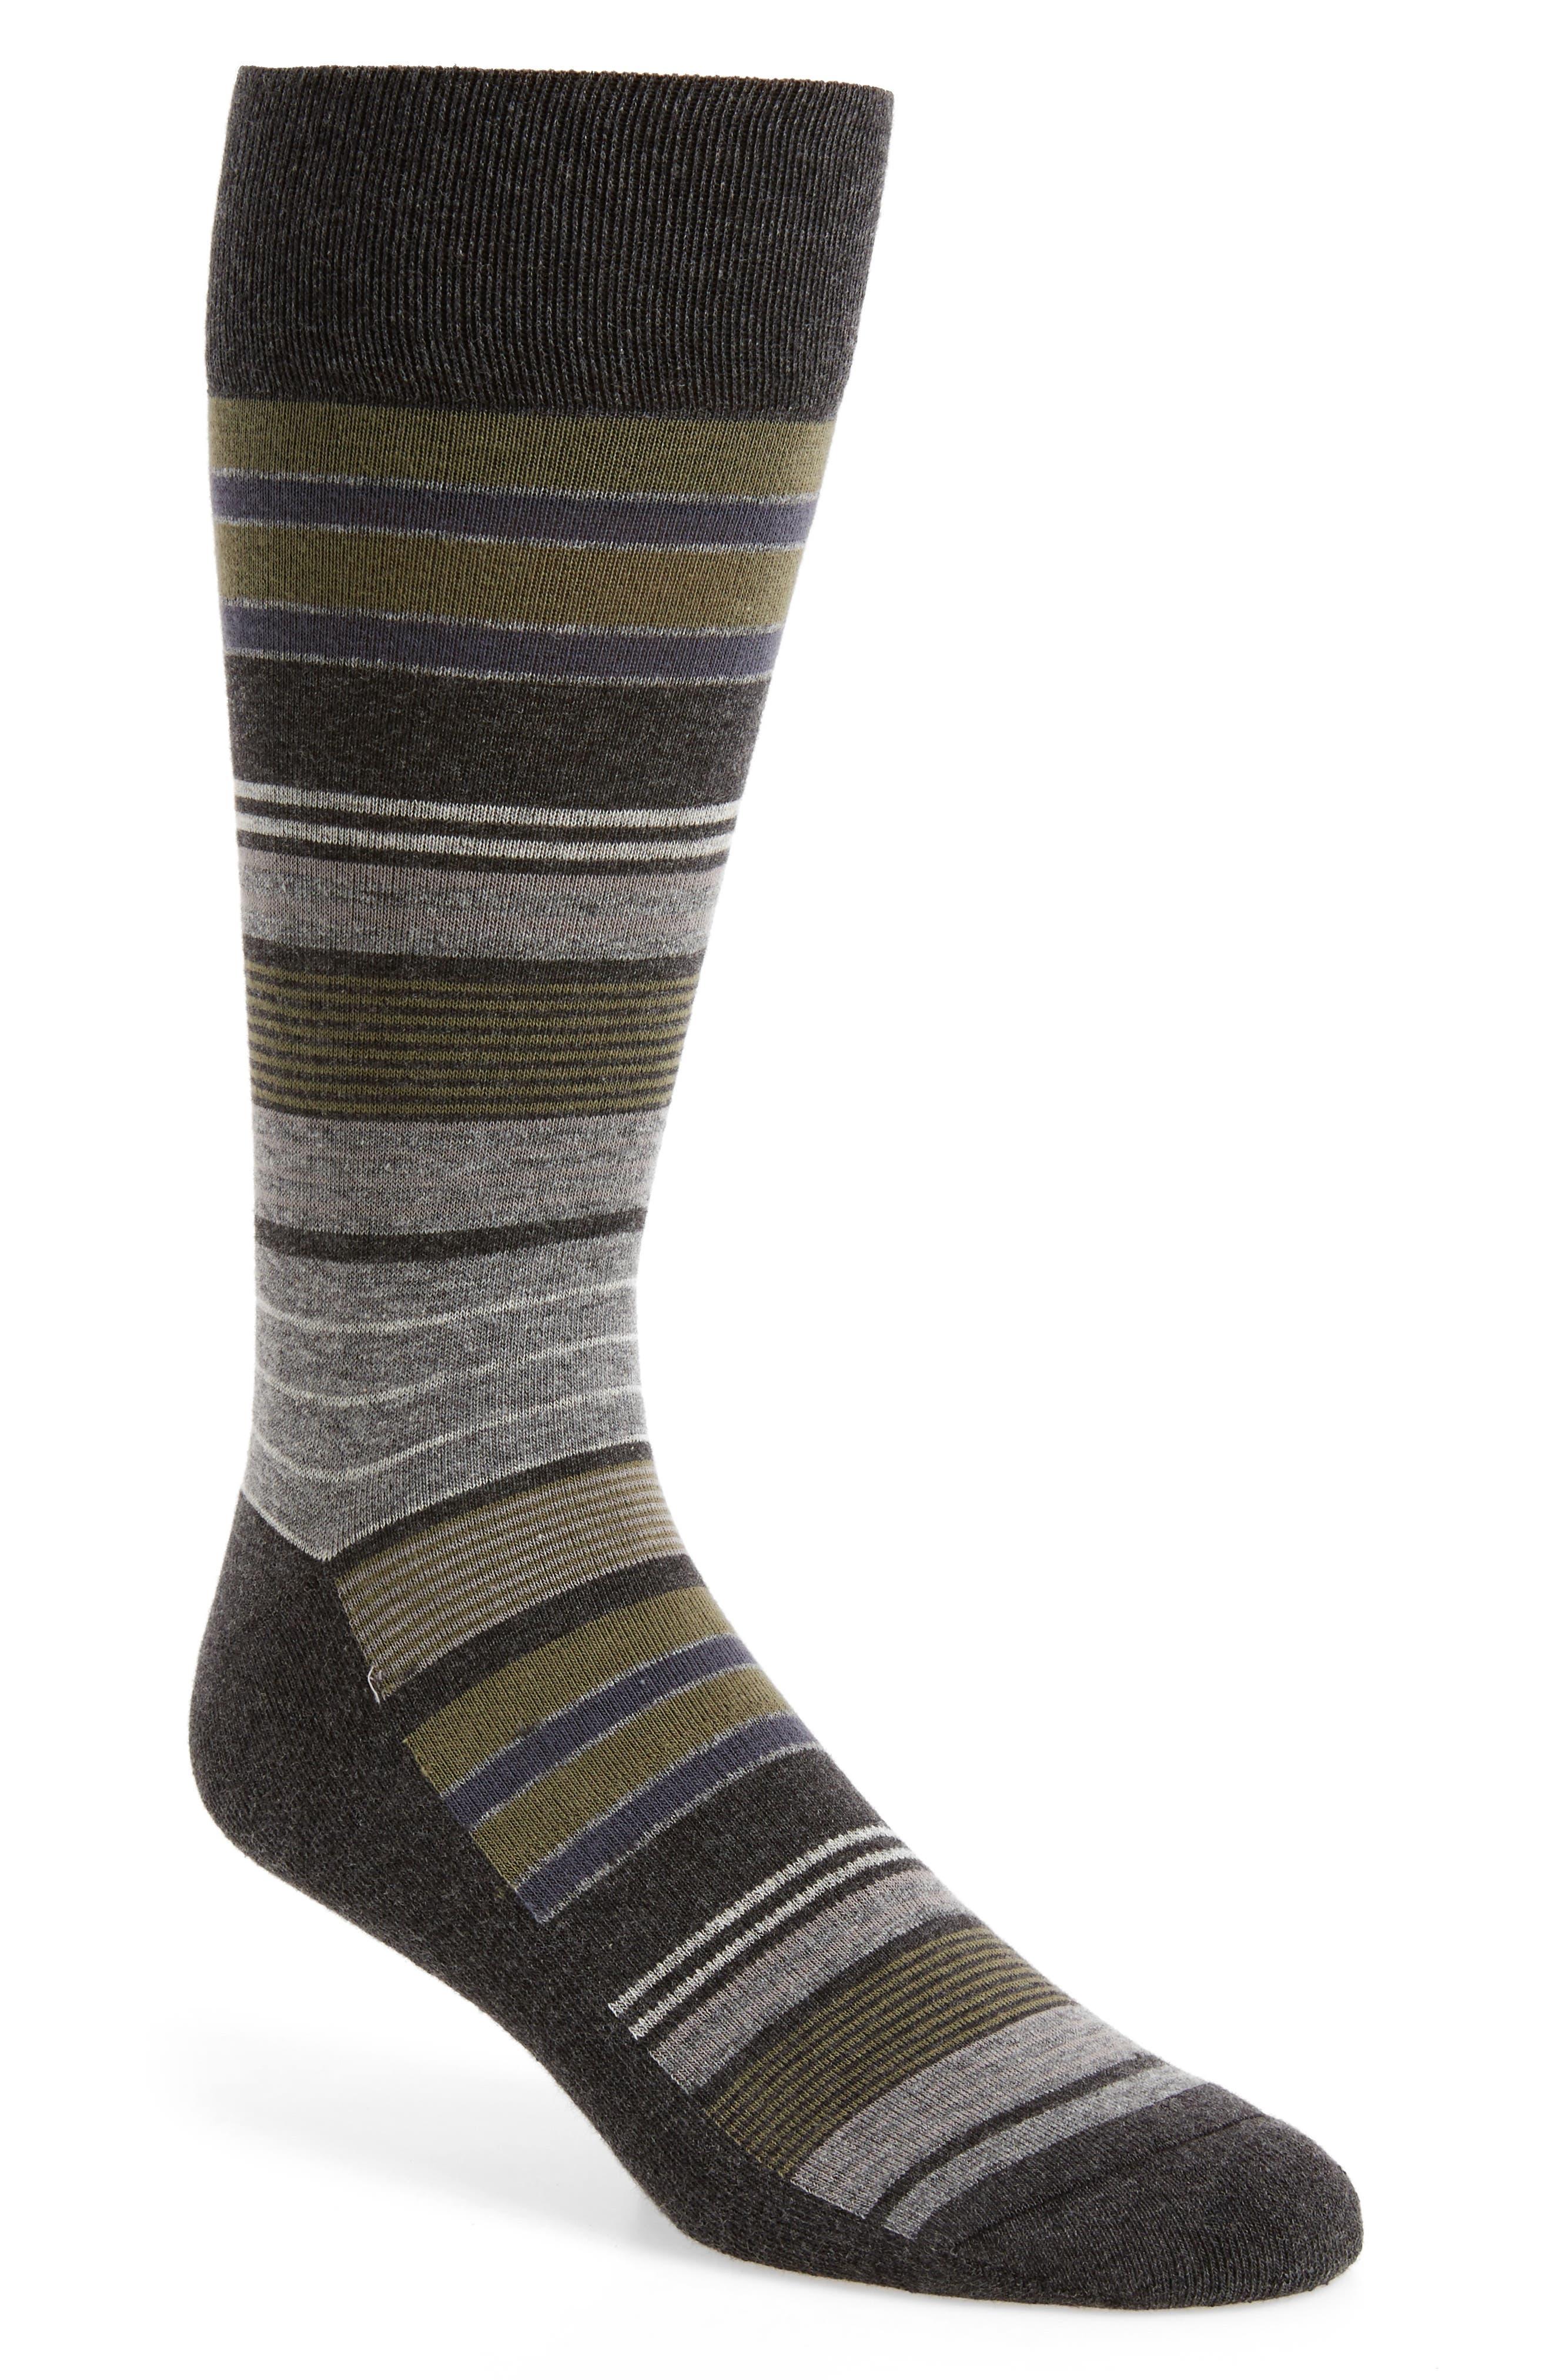 Alternate Image 1 Selected - Nordstrom Men's Shop Random Stripe Socks (3 for $30)